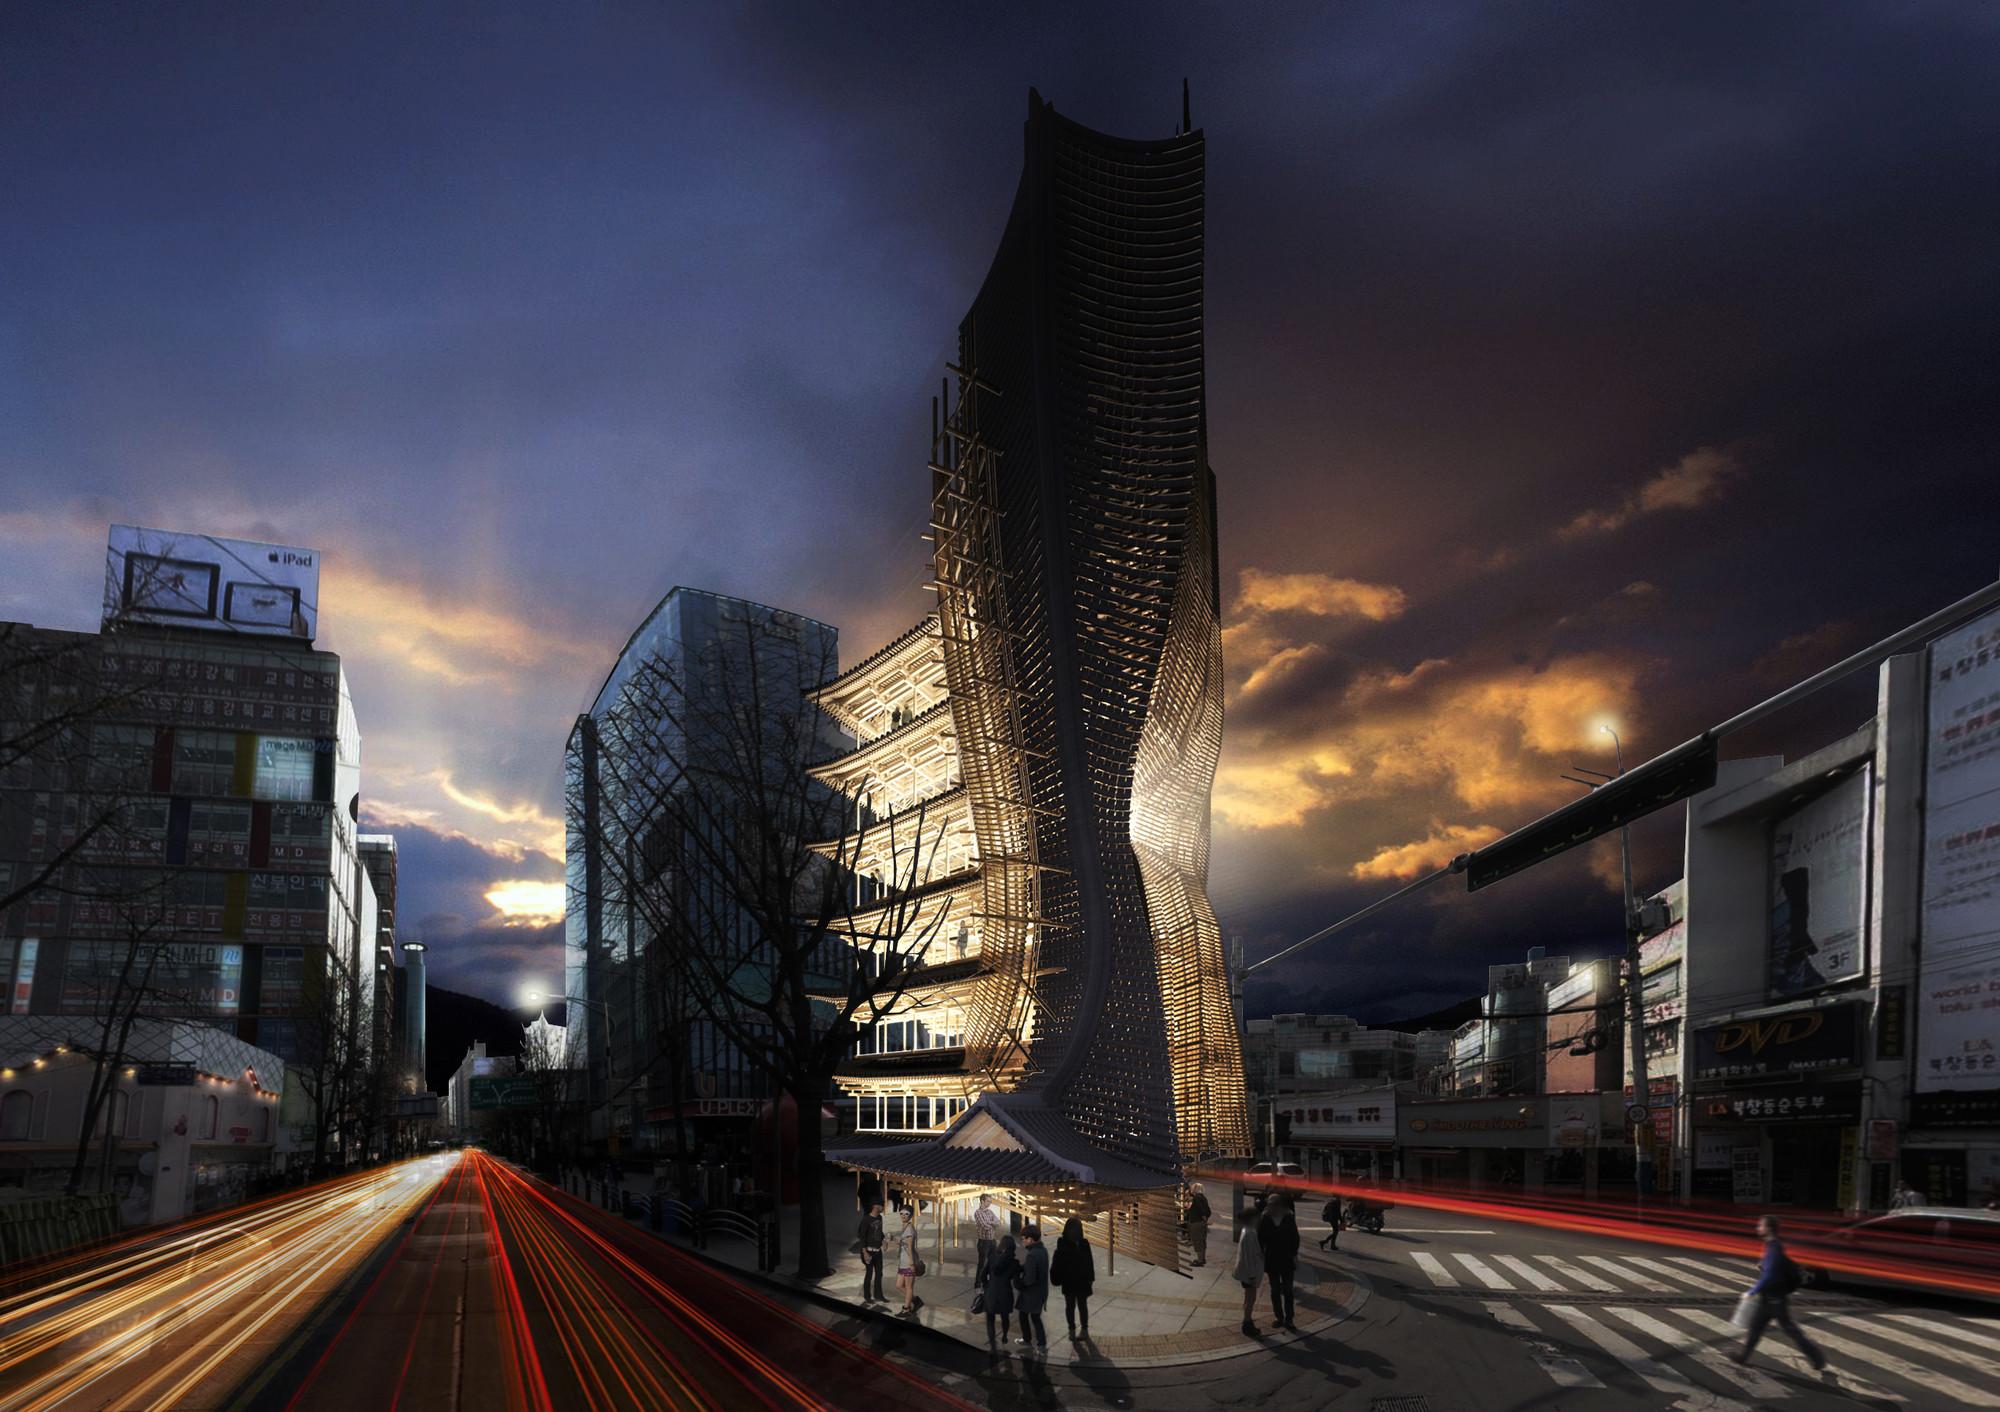 eVolo Skyscraper Winner 2014 Transforms Korean 'Hanok' Into Impressive High-Rise, Visualisation. Image © Yong Ju Lee